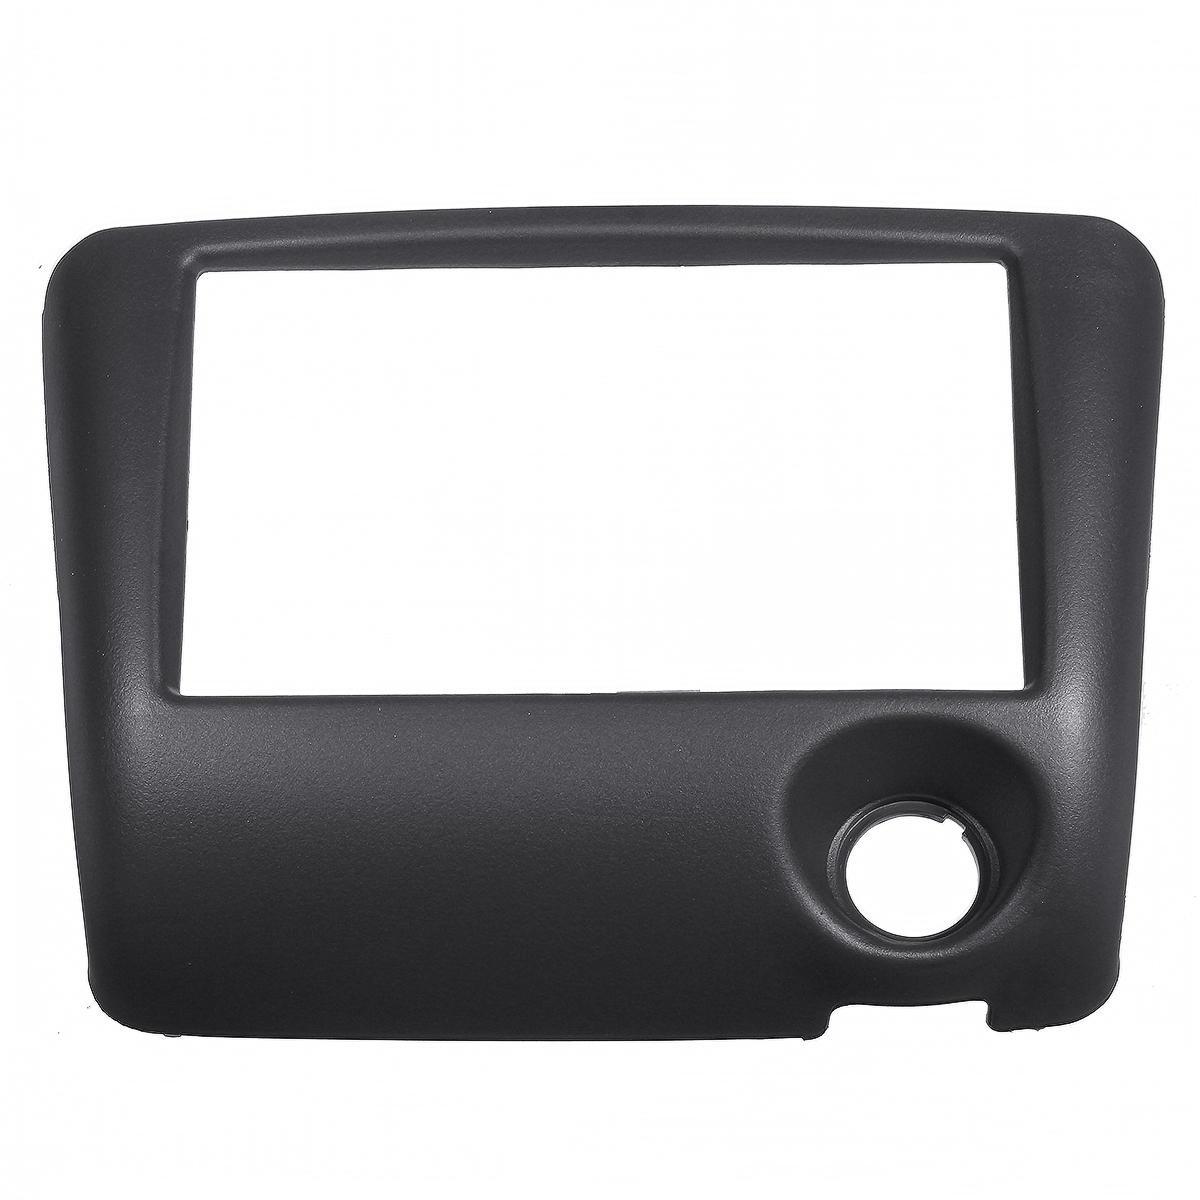 Car Stereo Frame Panel CD Radio Facia Trim Double 2DIN For Toyota Vitz Yaris Echo 1999-2005